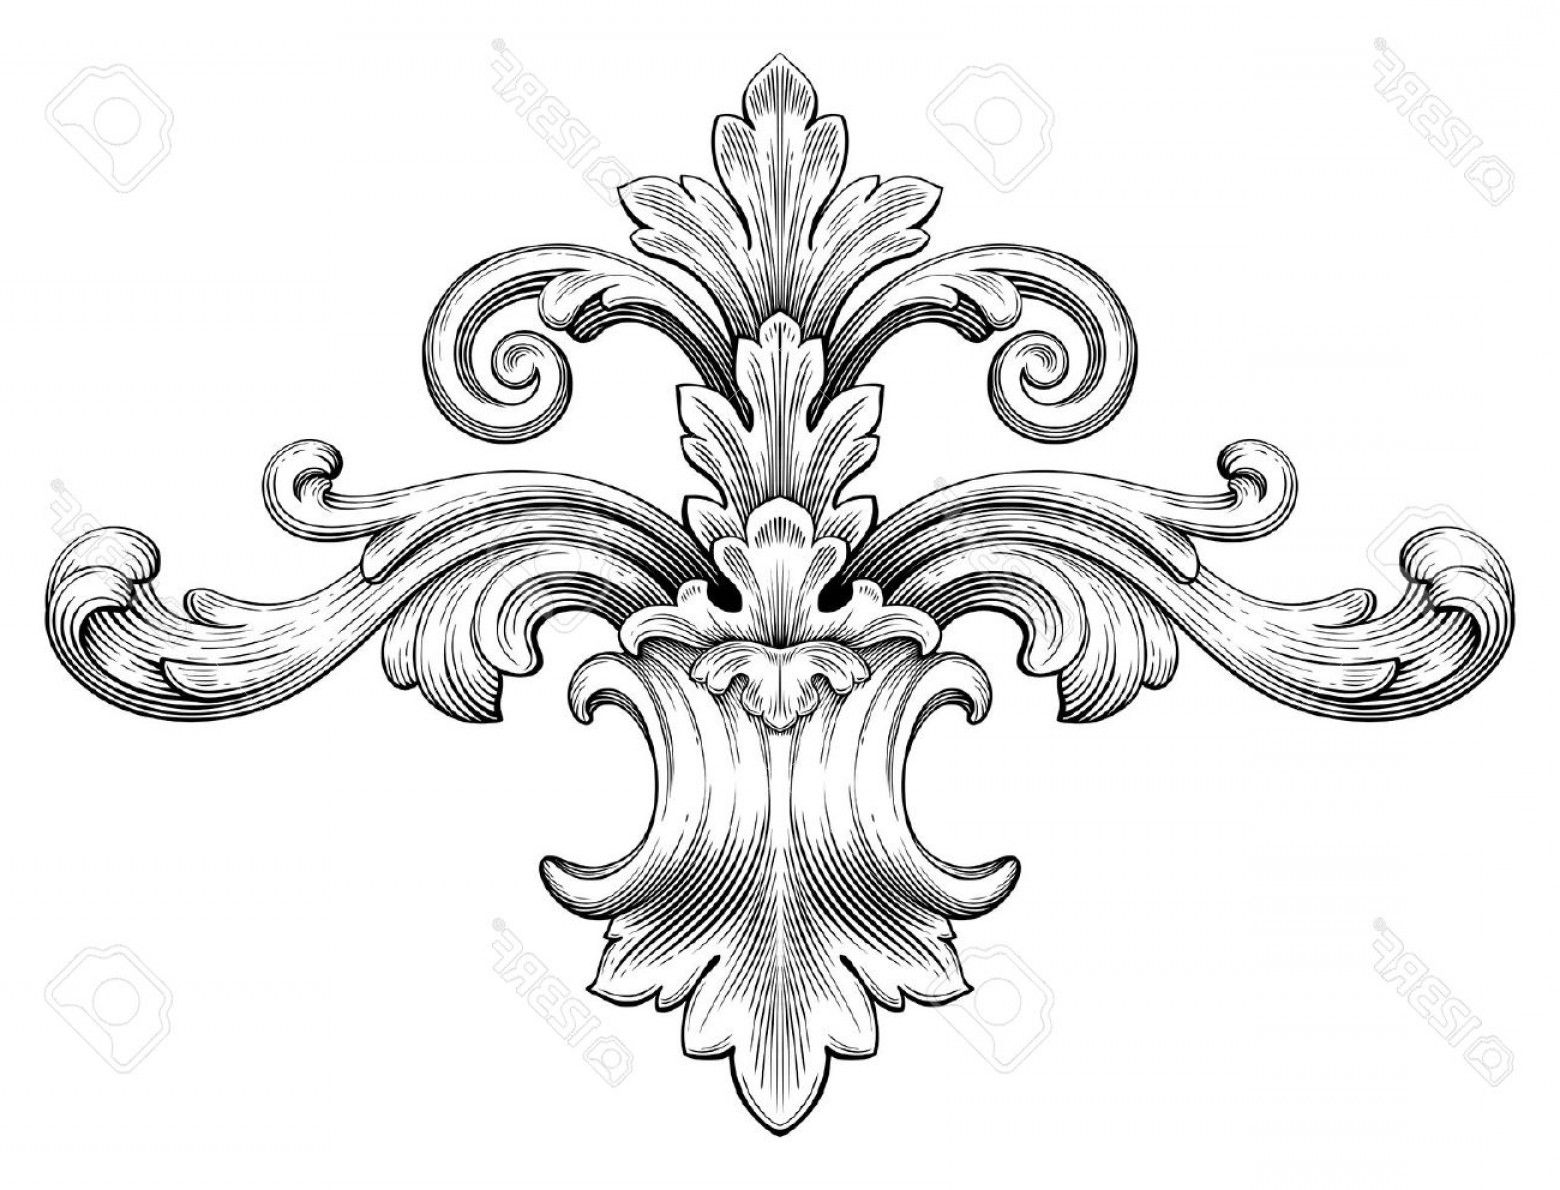 Gold Crown Medallion